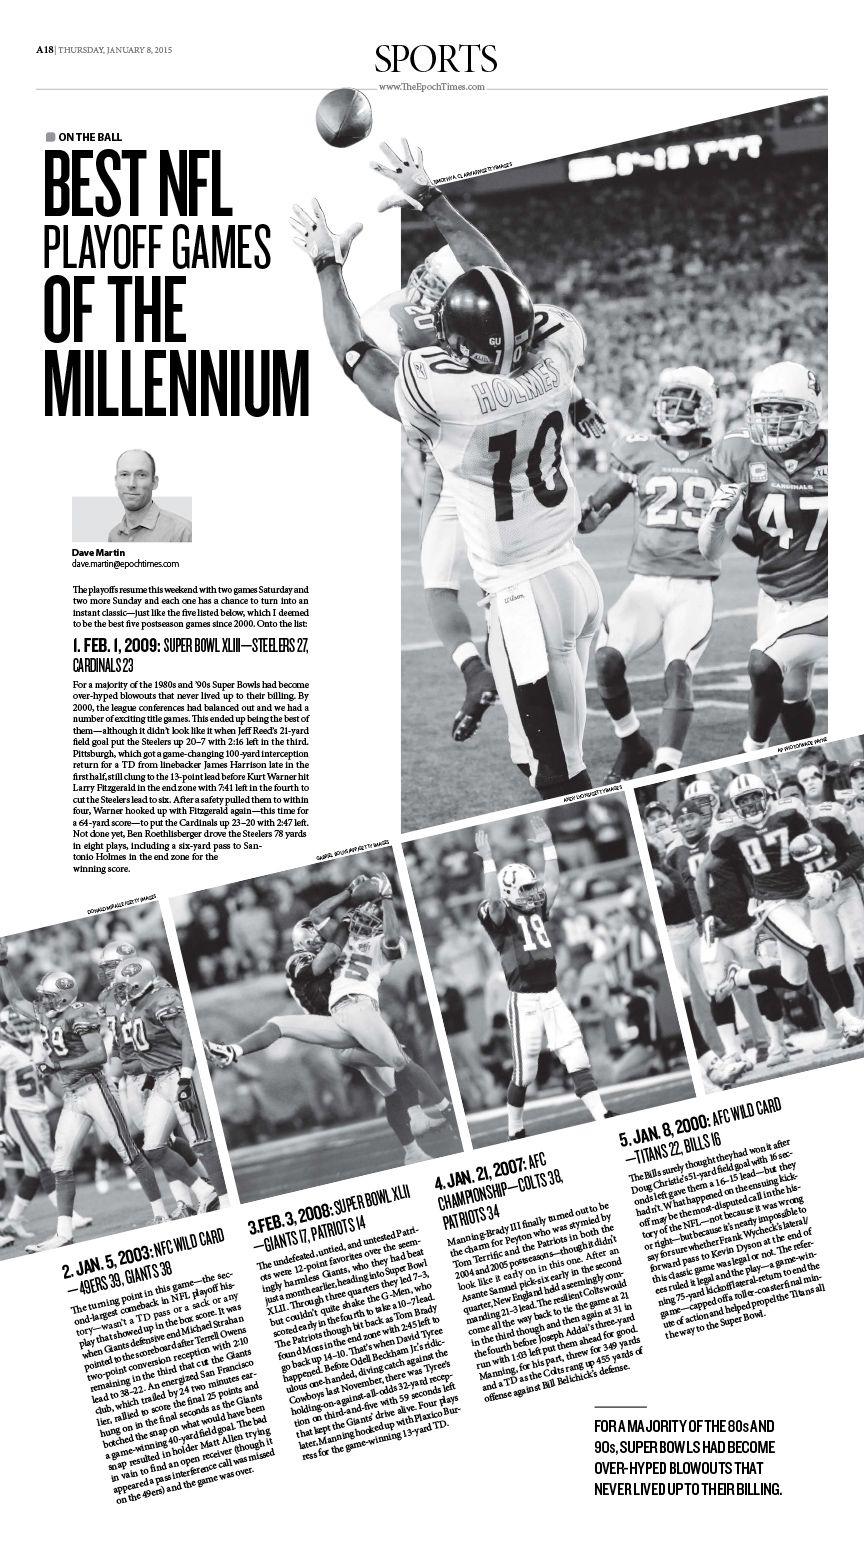 Best NFL Playoff Games of the Millennium|Epoch Times